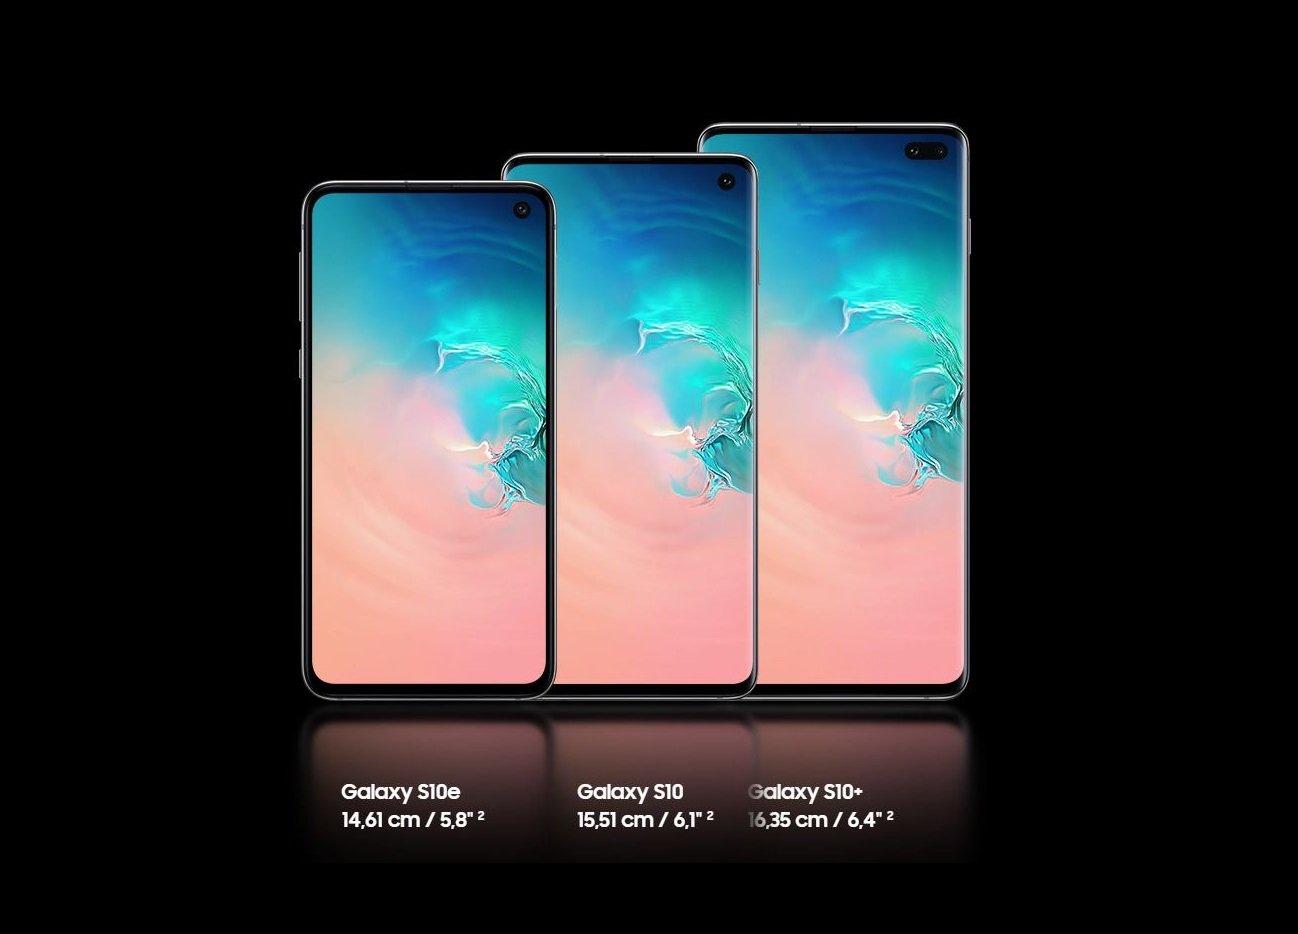 Samsung_Galaxy_S10_S10e_S10_Plus_Größe